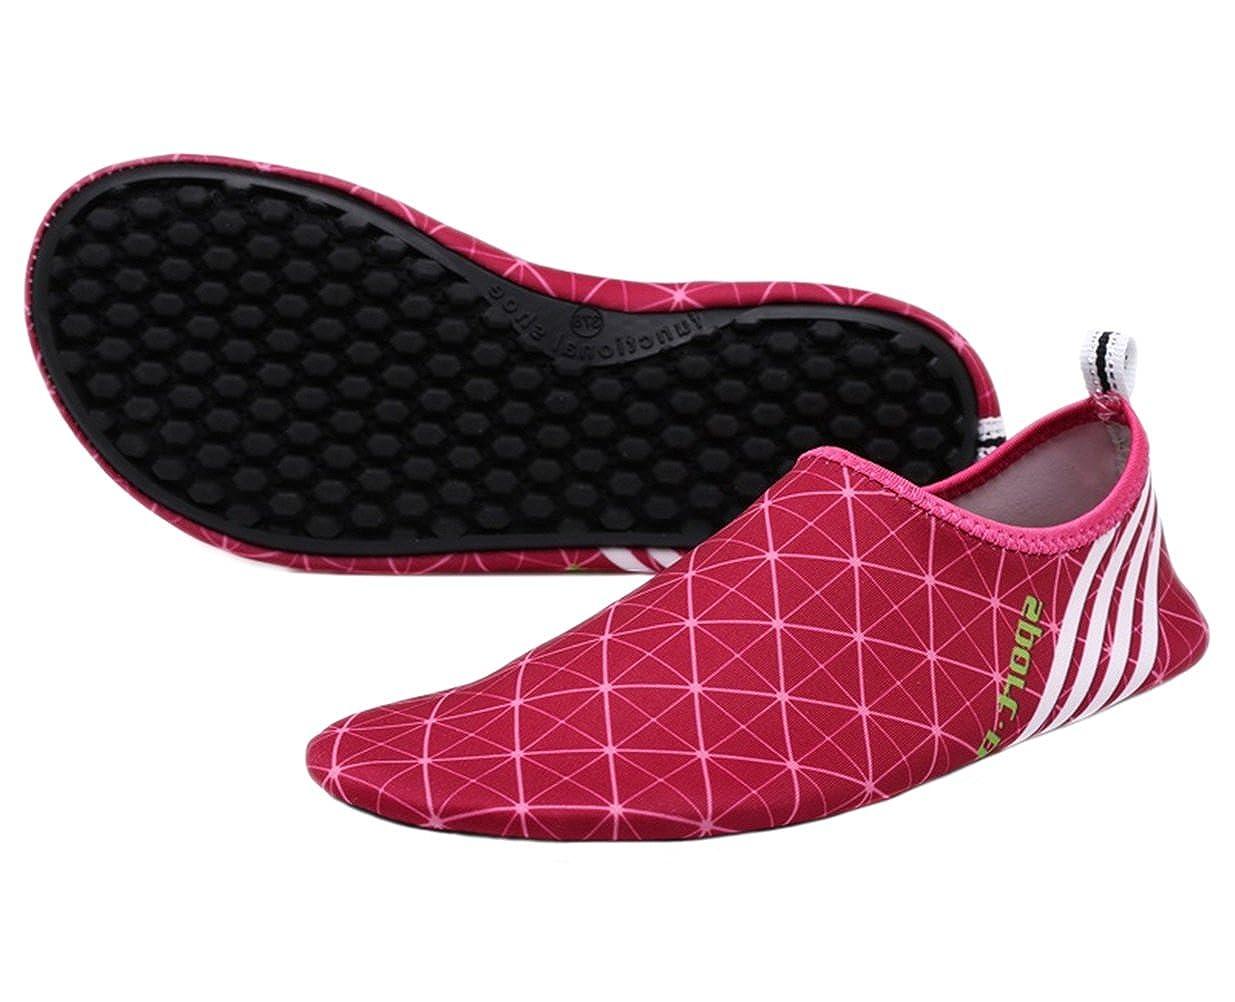 Santimon Aqua Socks Water Shoes Wave Pool Beach Swim Yoga Exercise Sports Slip On Plaid